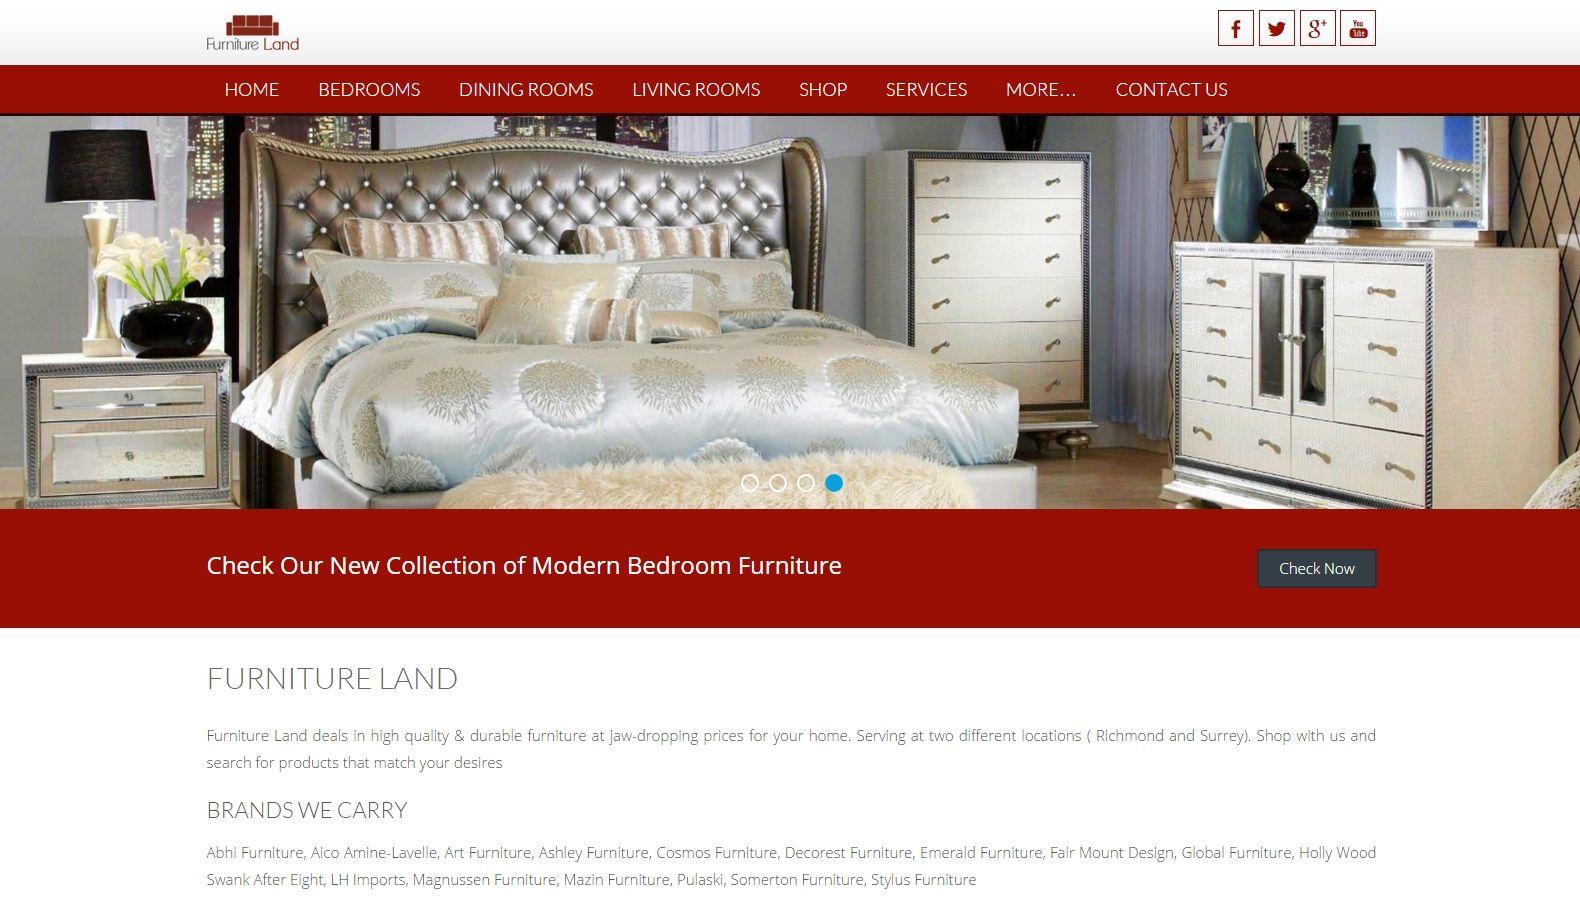 FURNITURE LAND - SEO & Web Design Services, Surrey BC, Delta Website ...